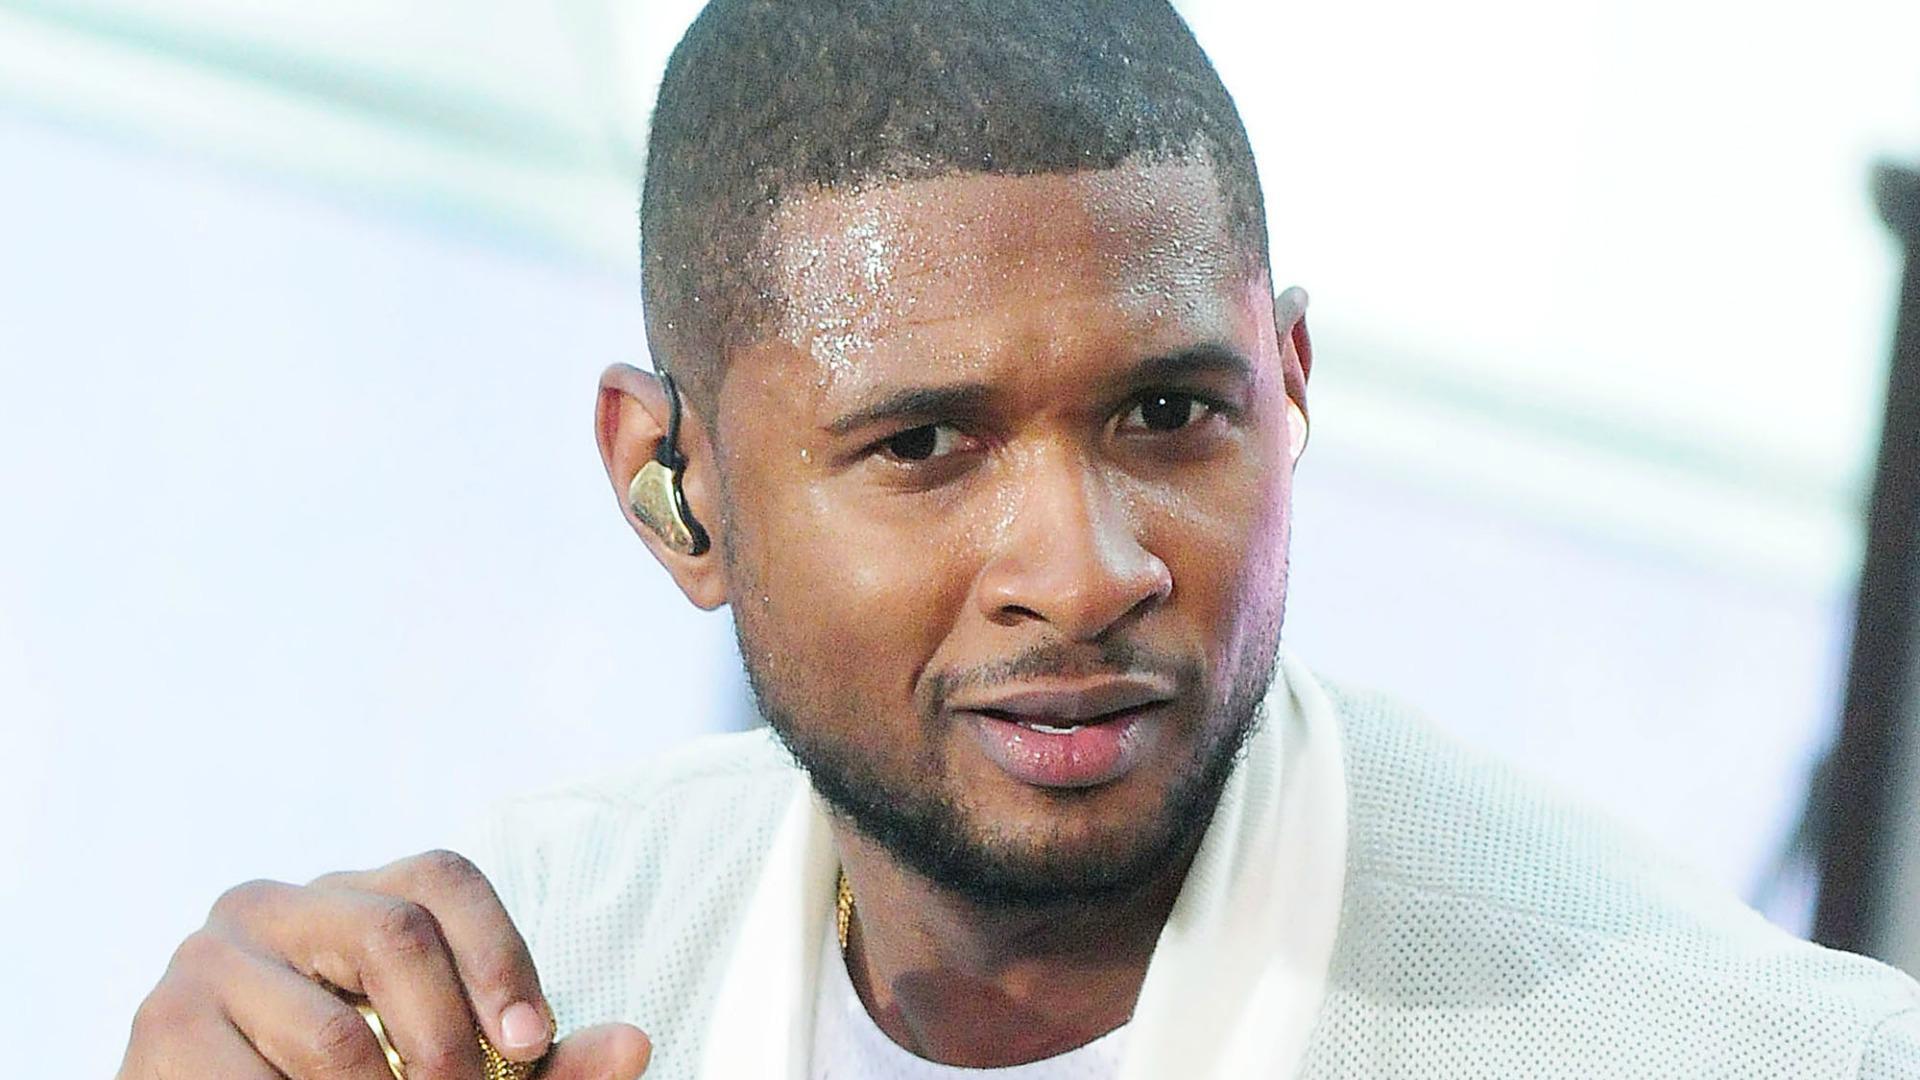 Usher cock